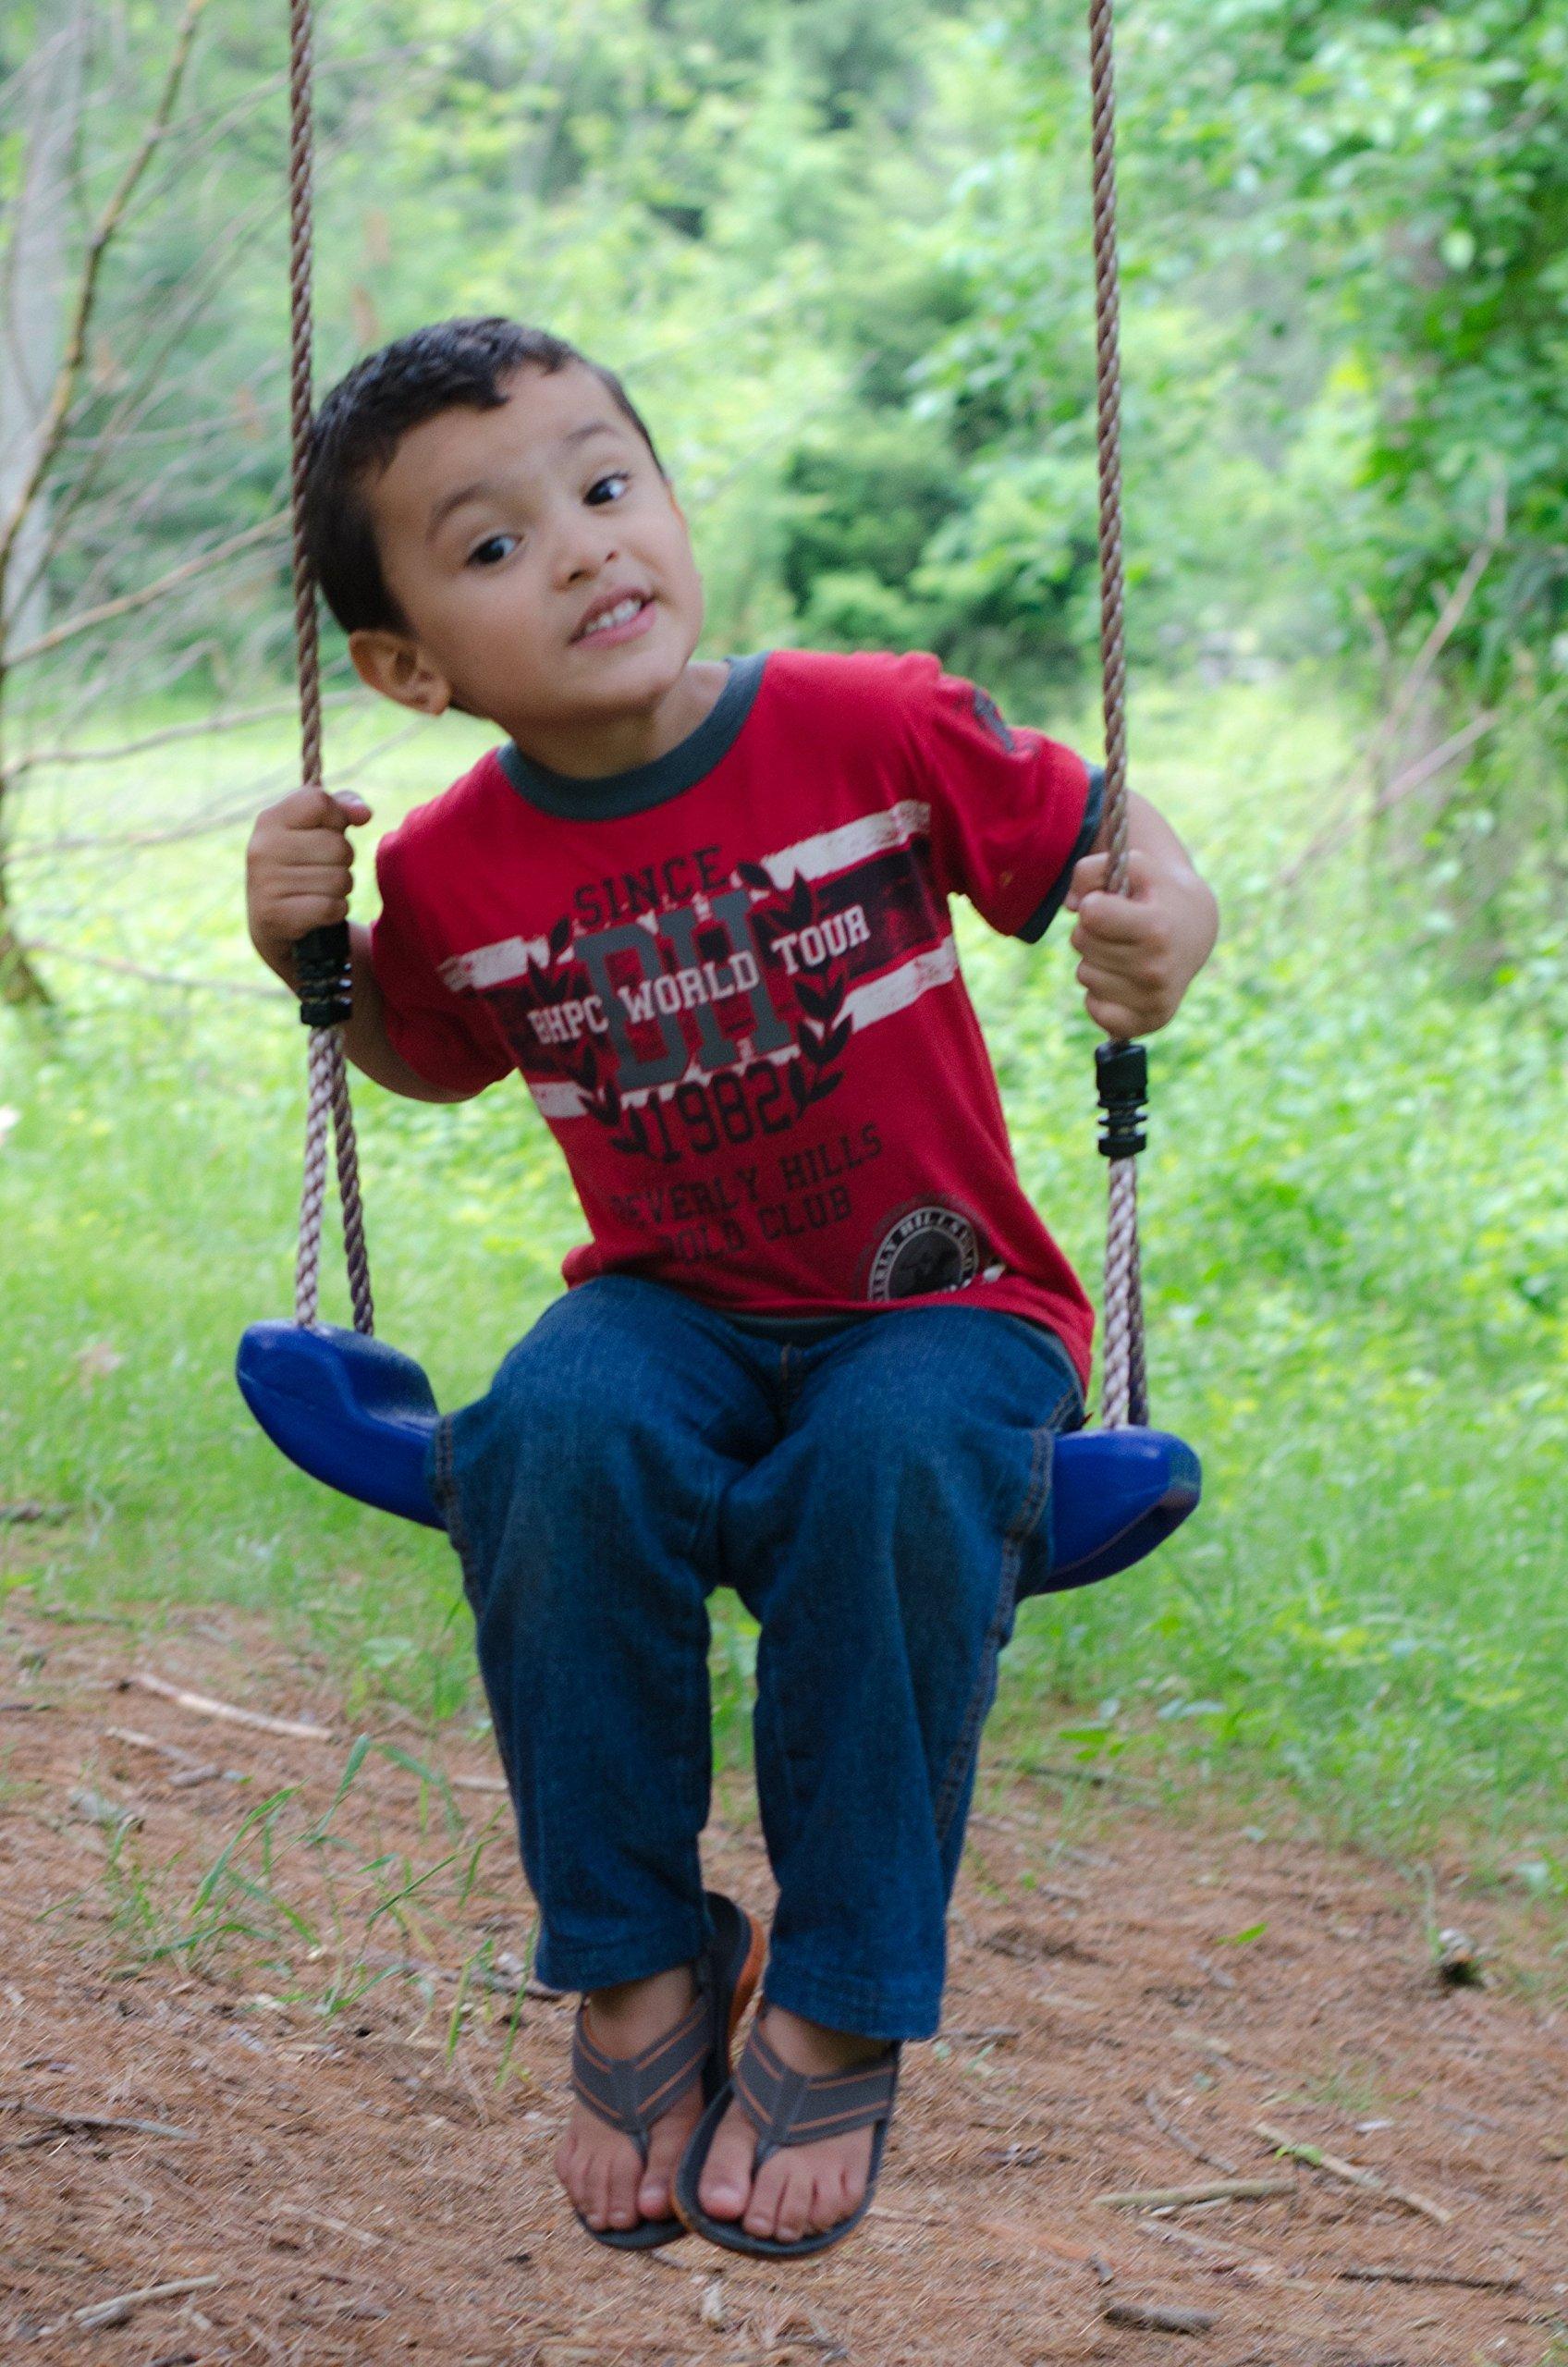 SUMMERSDREAM Rigid Blue Child Swing by SUMMERSDREAM